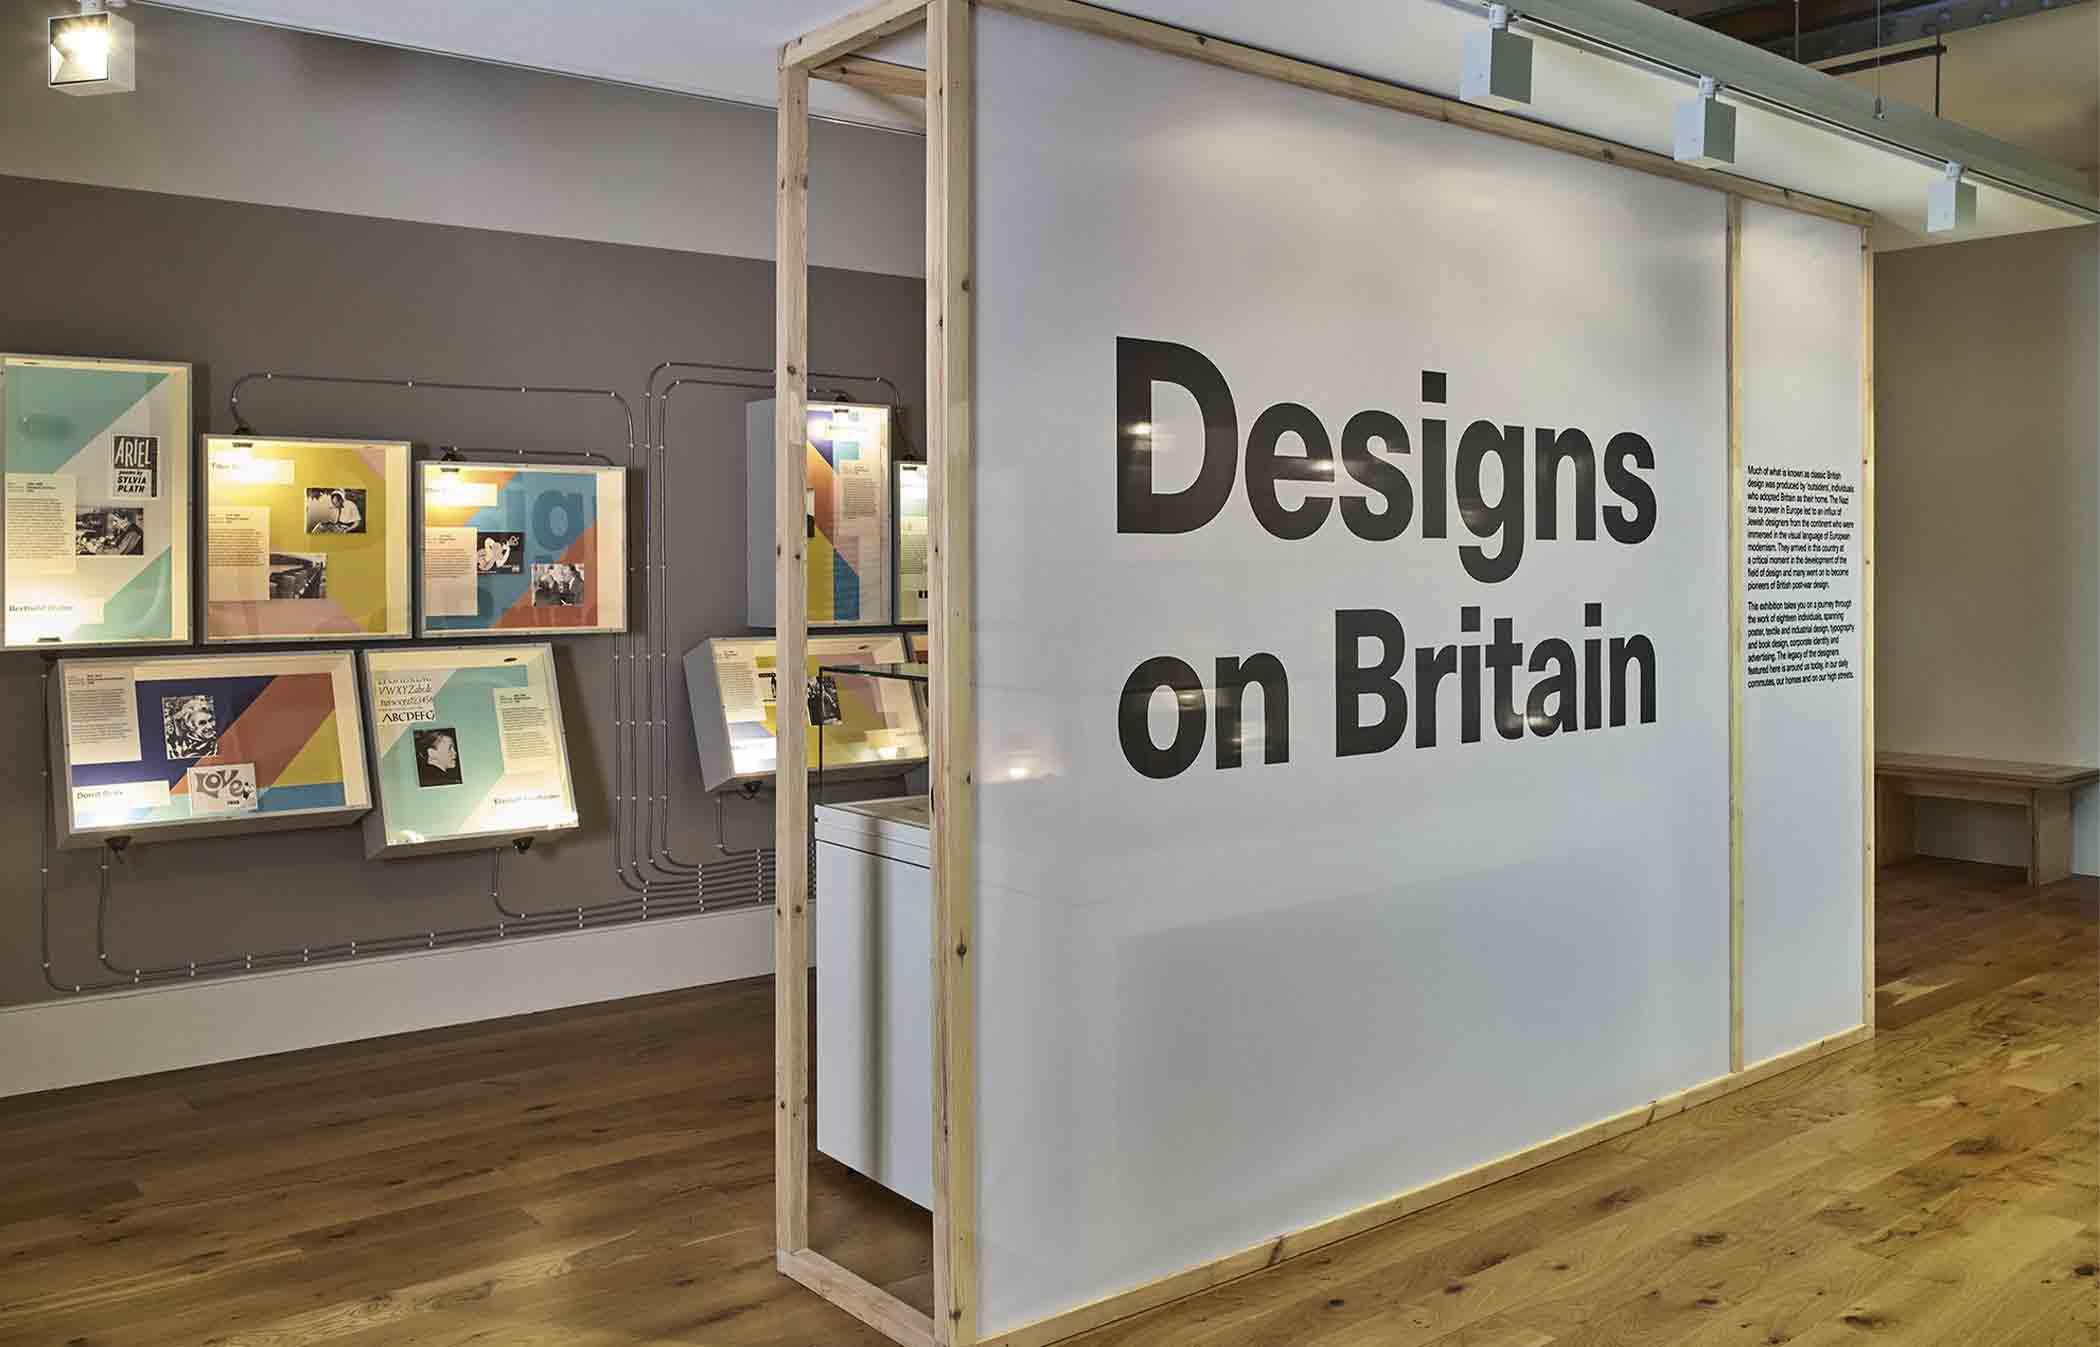 Jewish Museum, London Designs on Britain